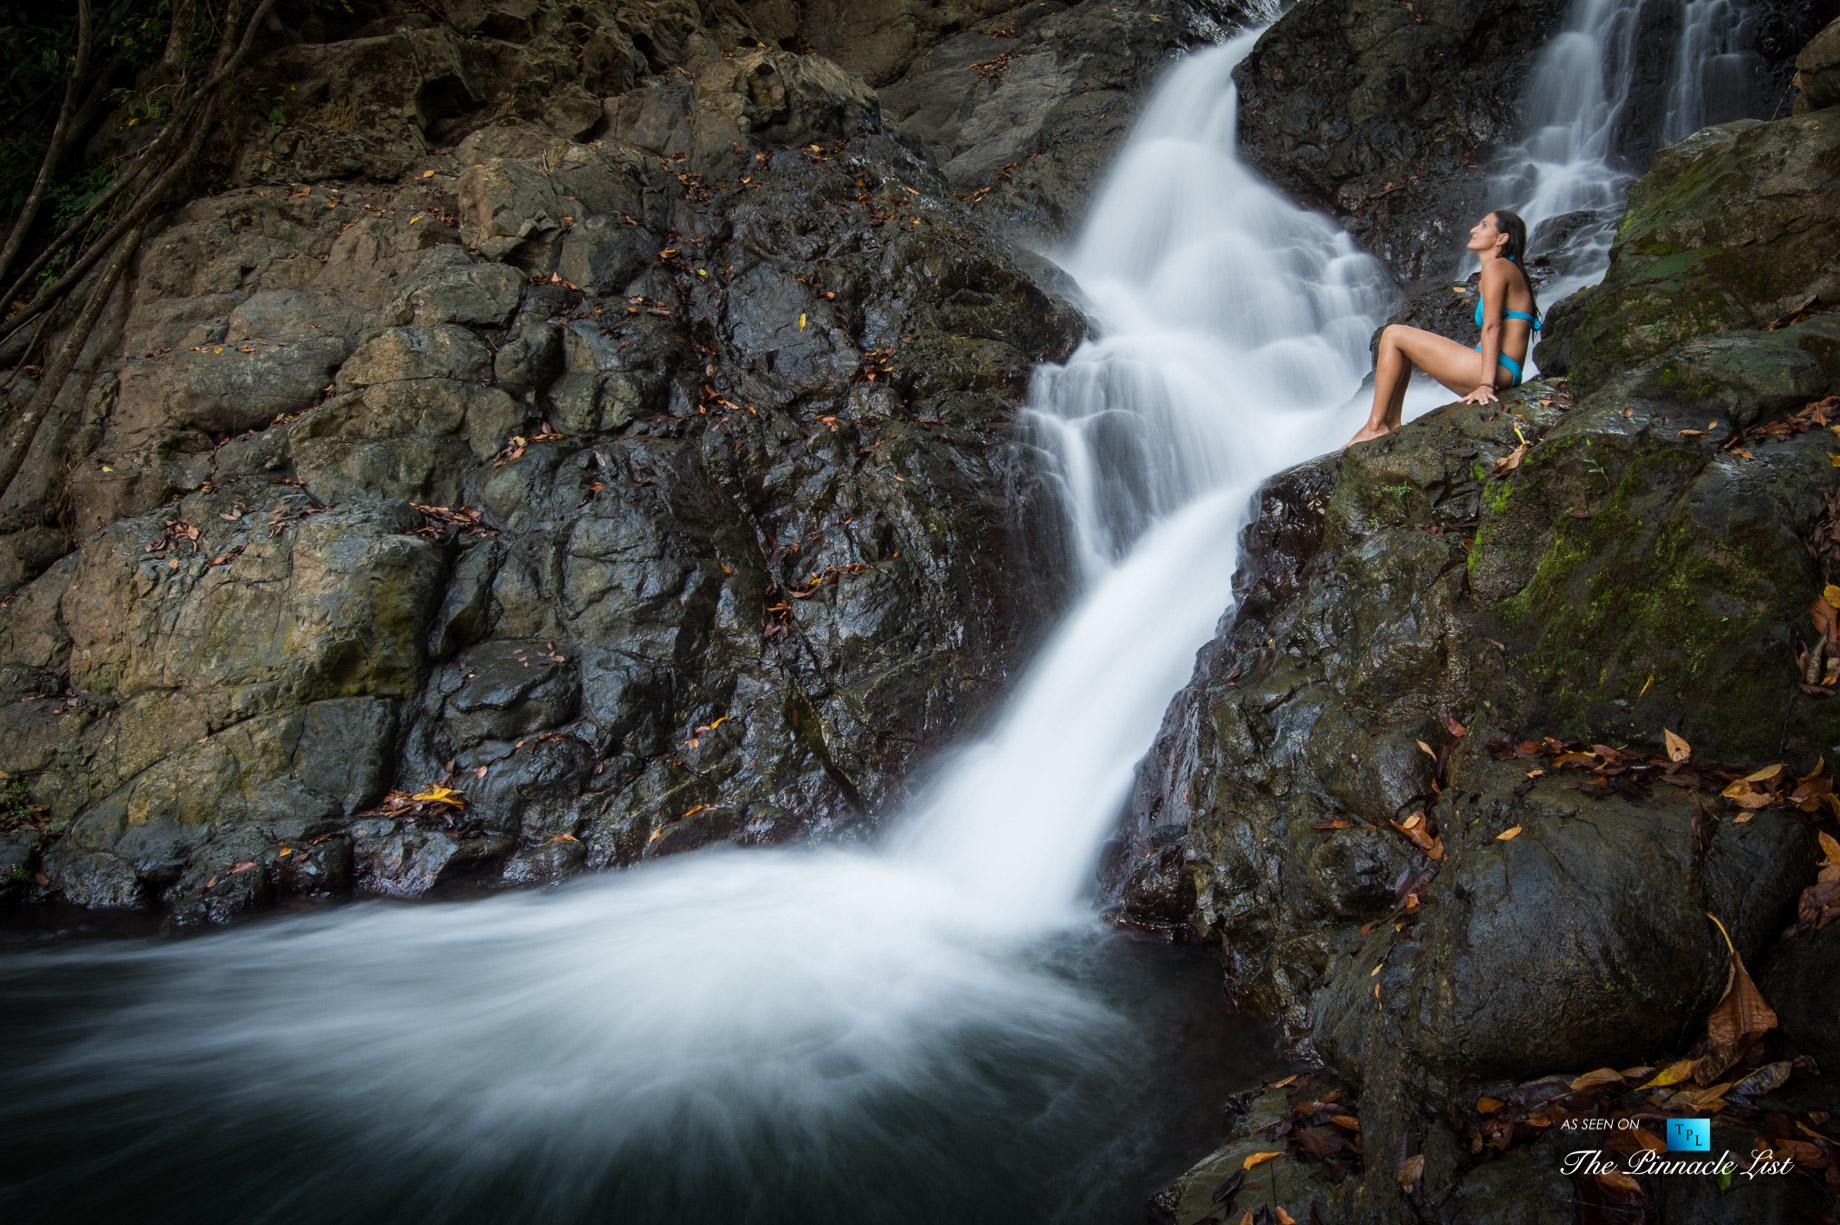 Tambor Tropical Beach Resort – Tambor, Puntarenas, Costa Rica – Panica Waterfall Swim